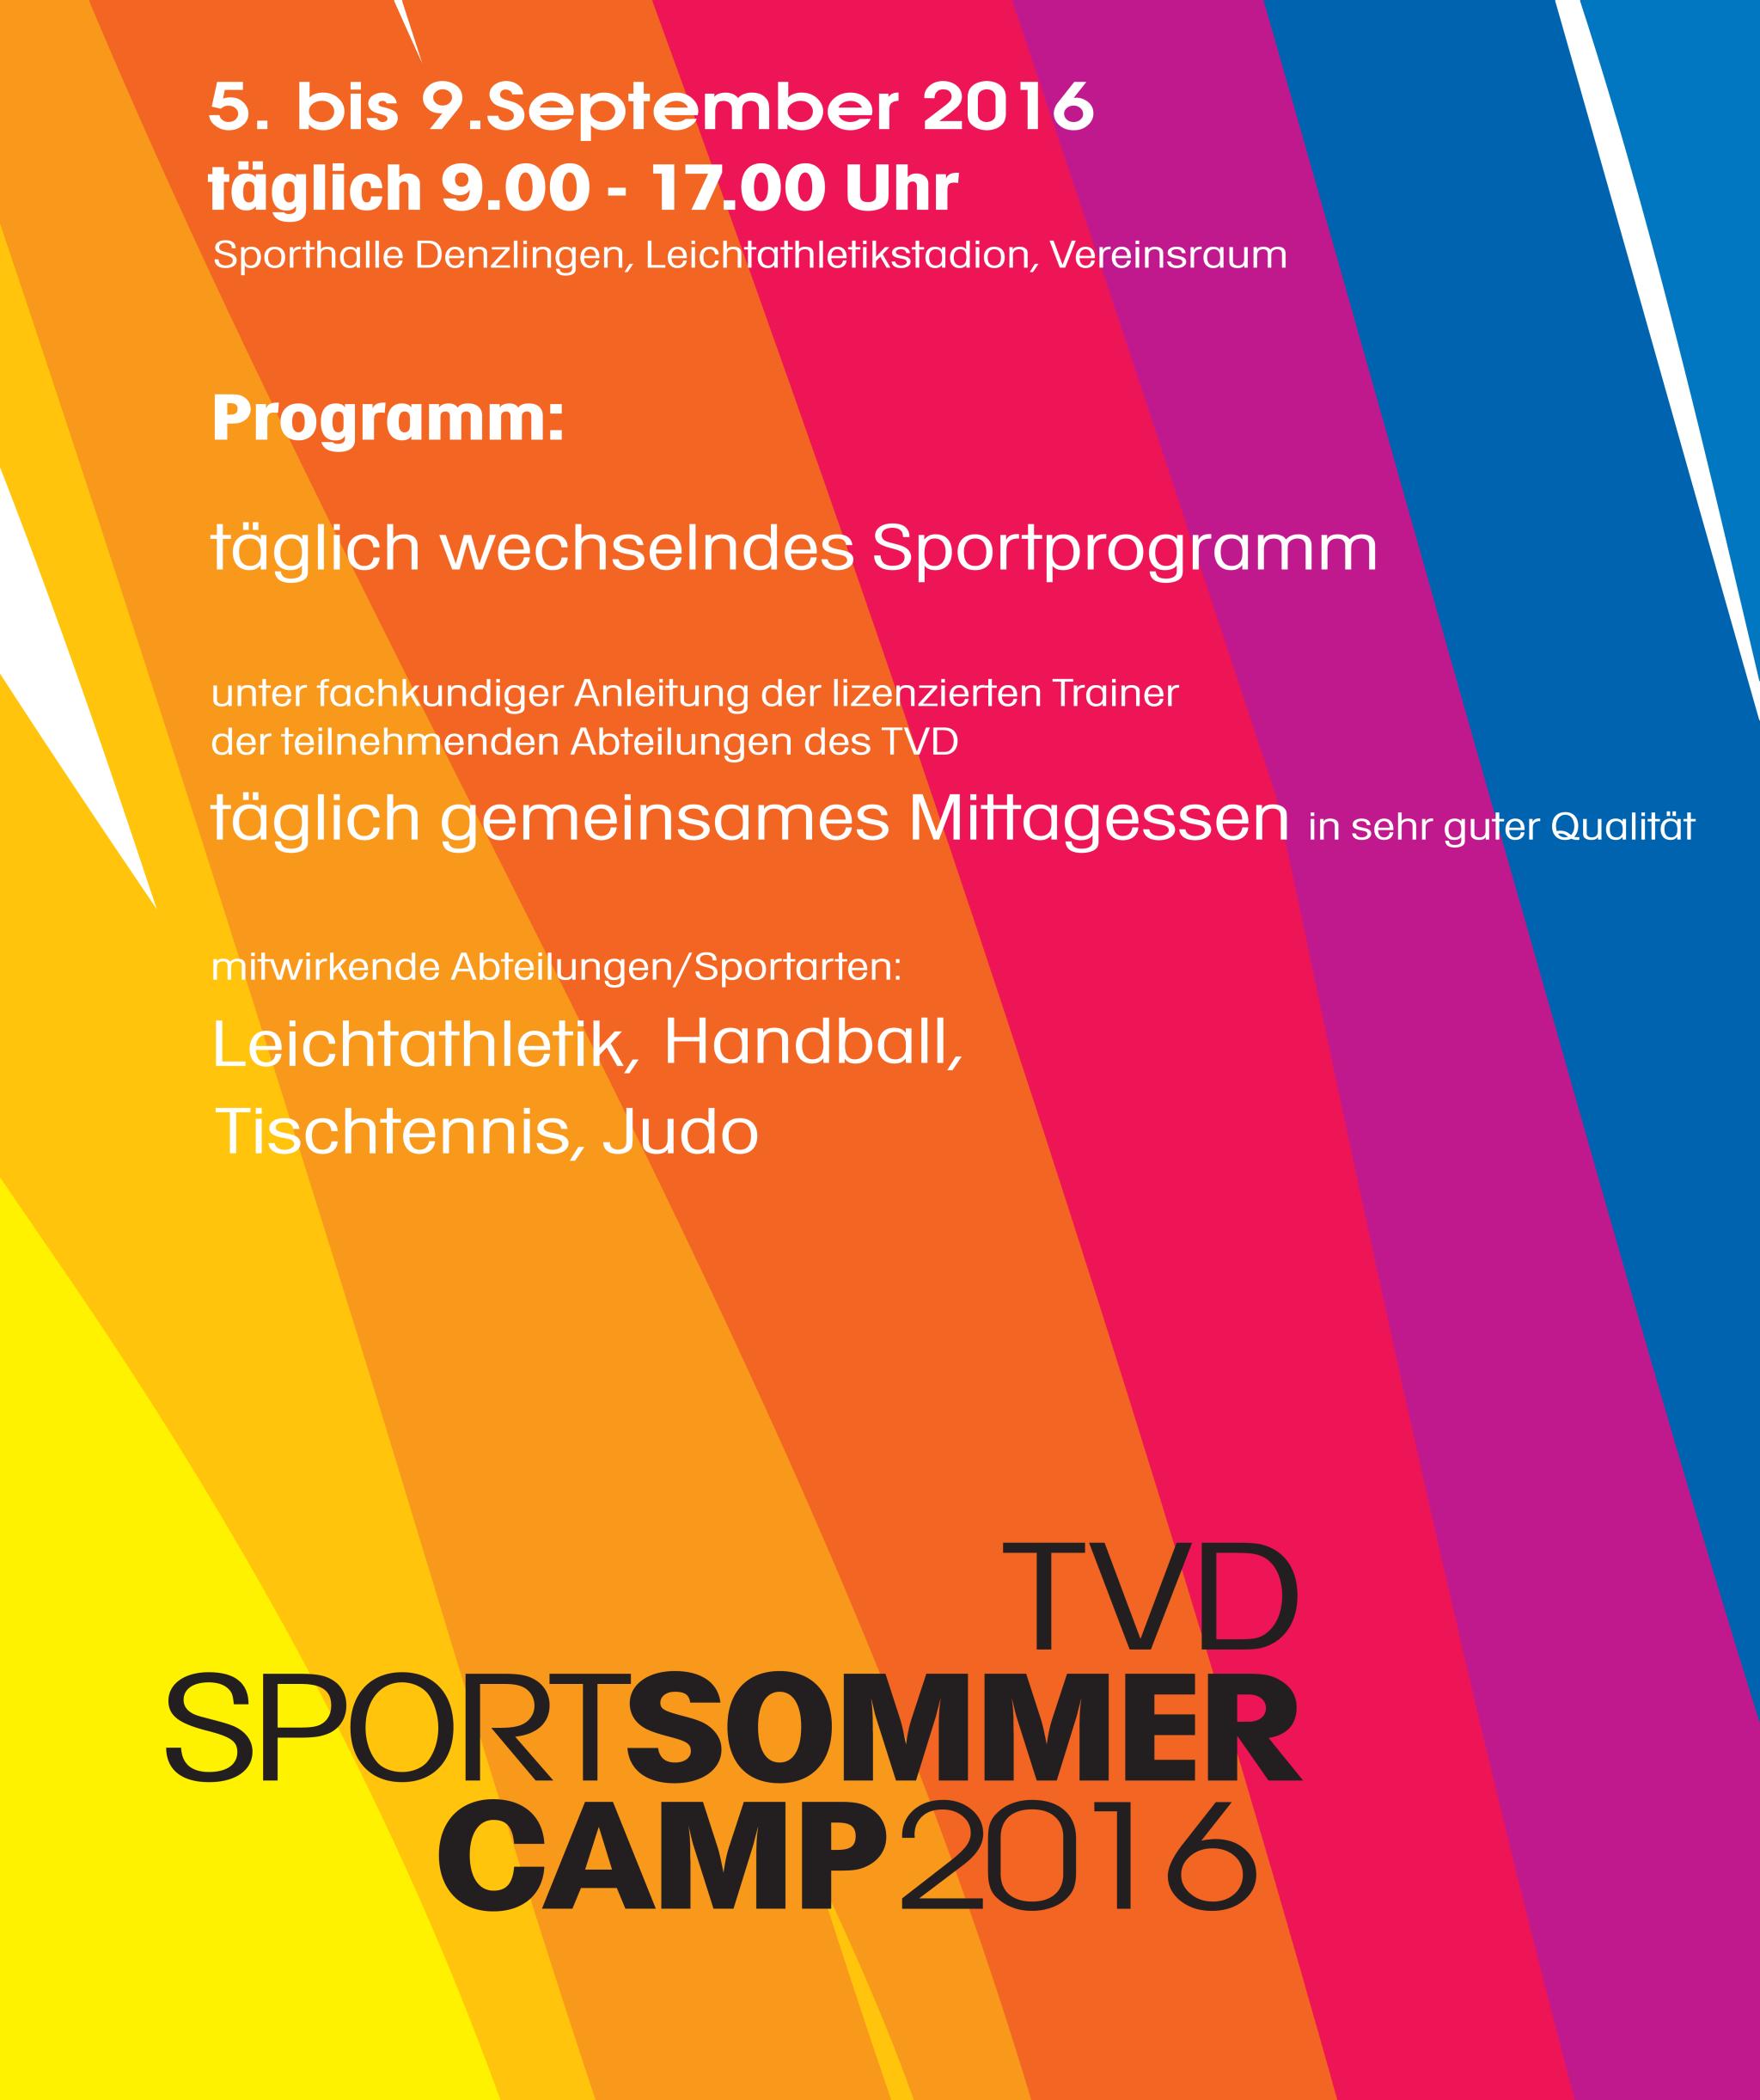 flyer-tvd-sommercamp-2016_1b